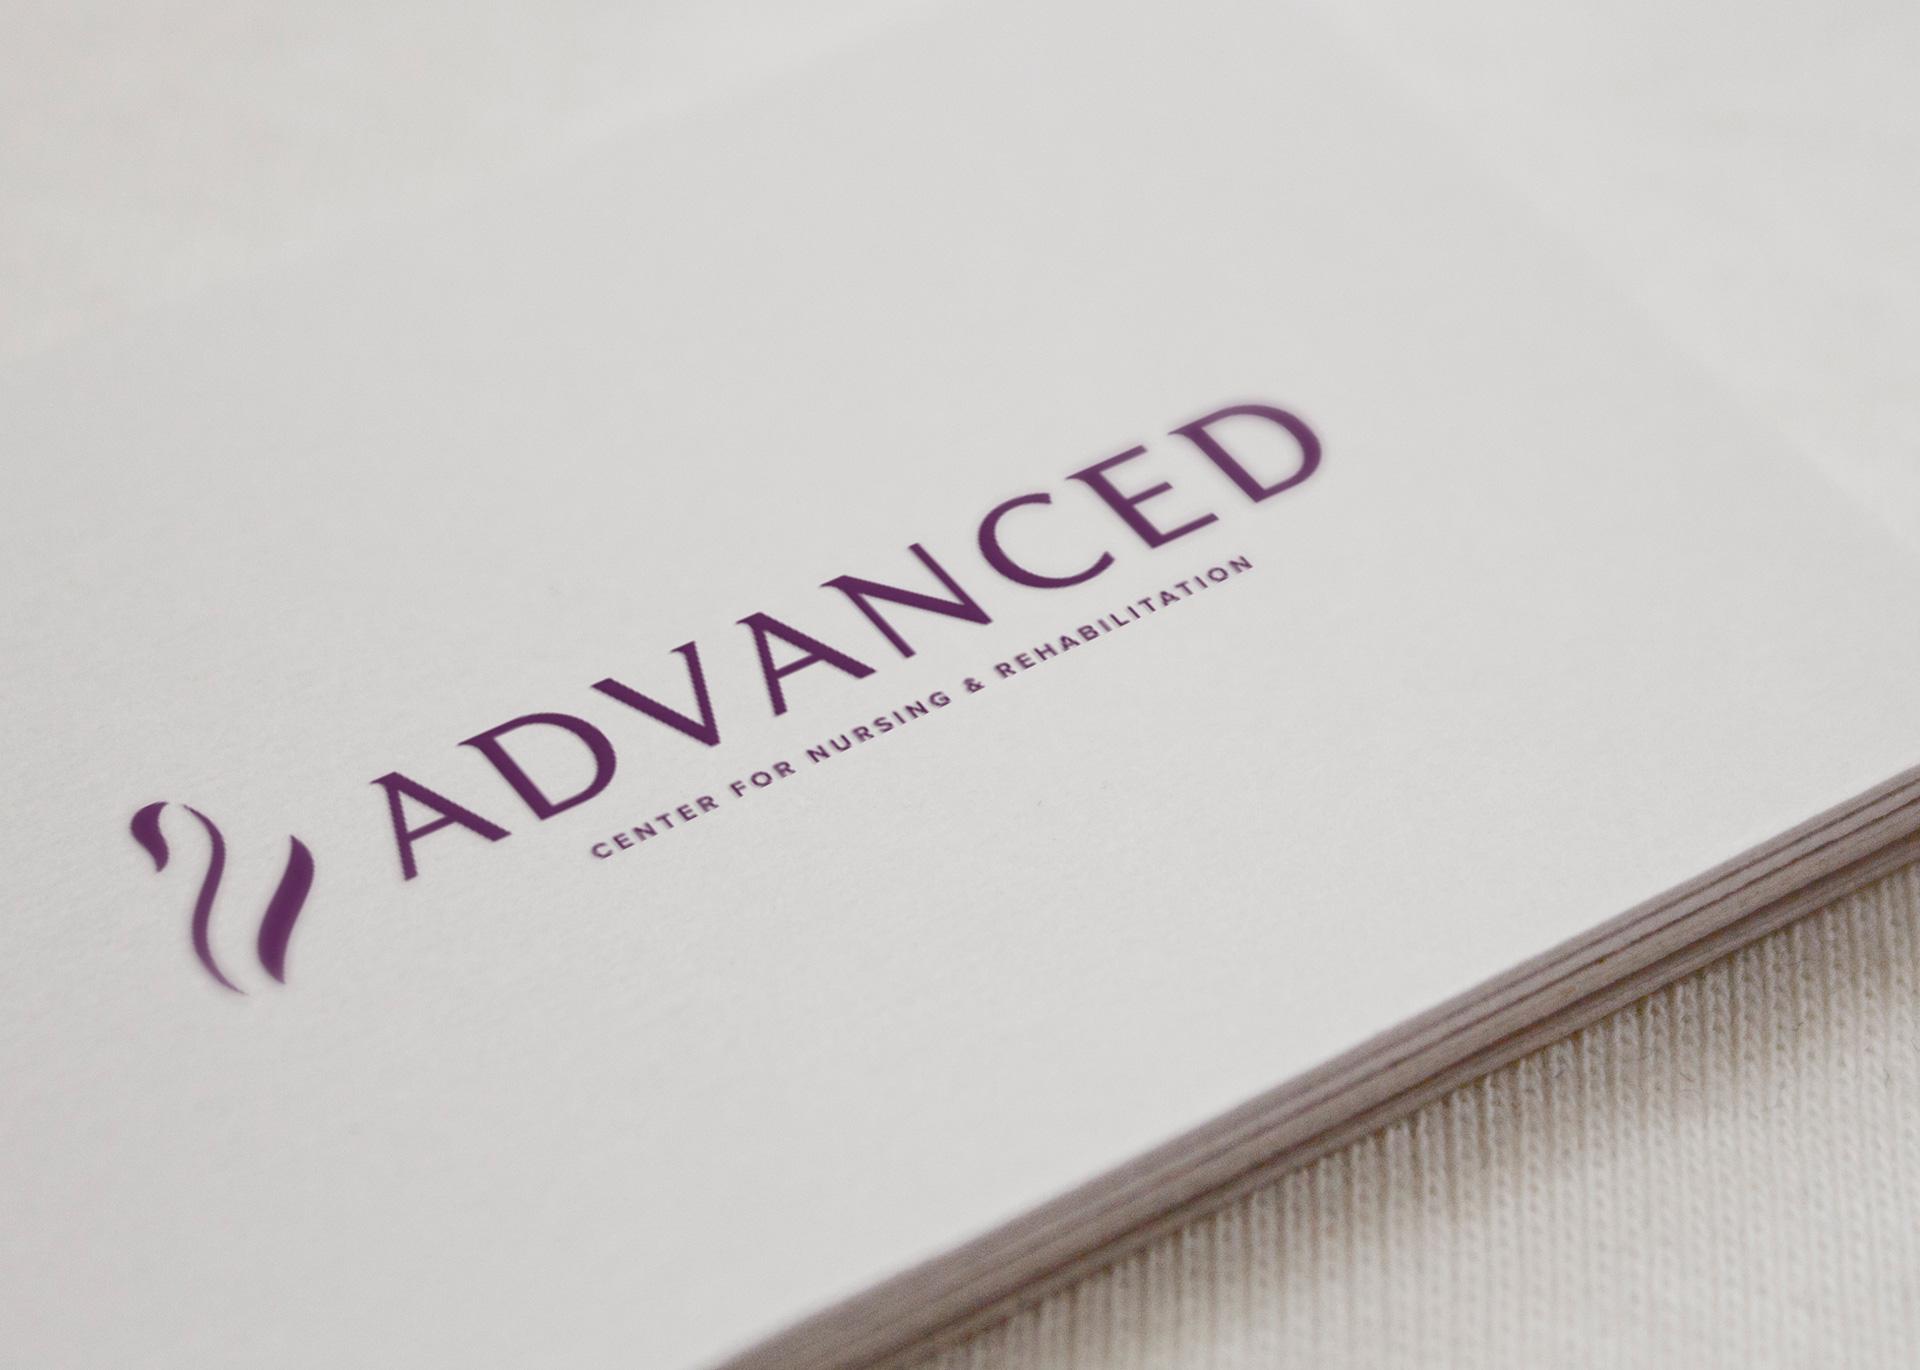 Advanced Center for Nursing & Rehabilitation